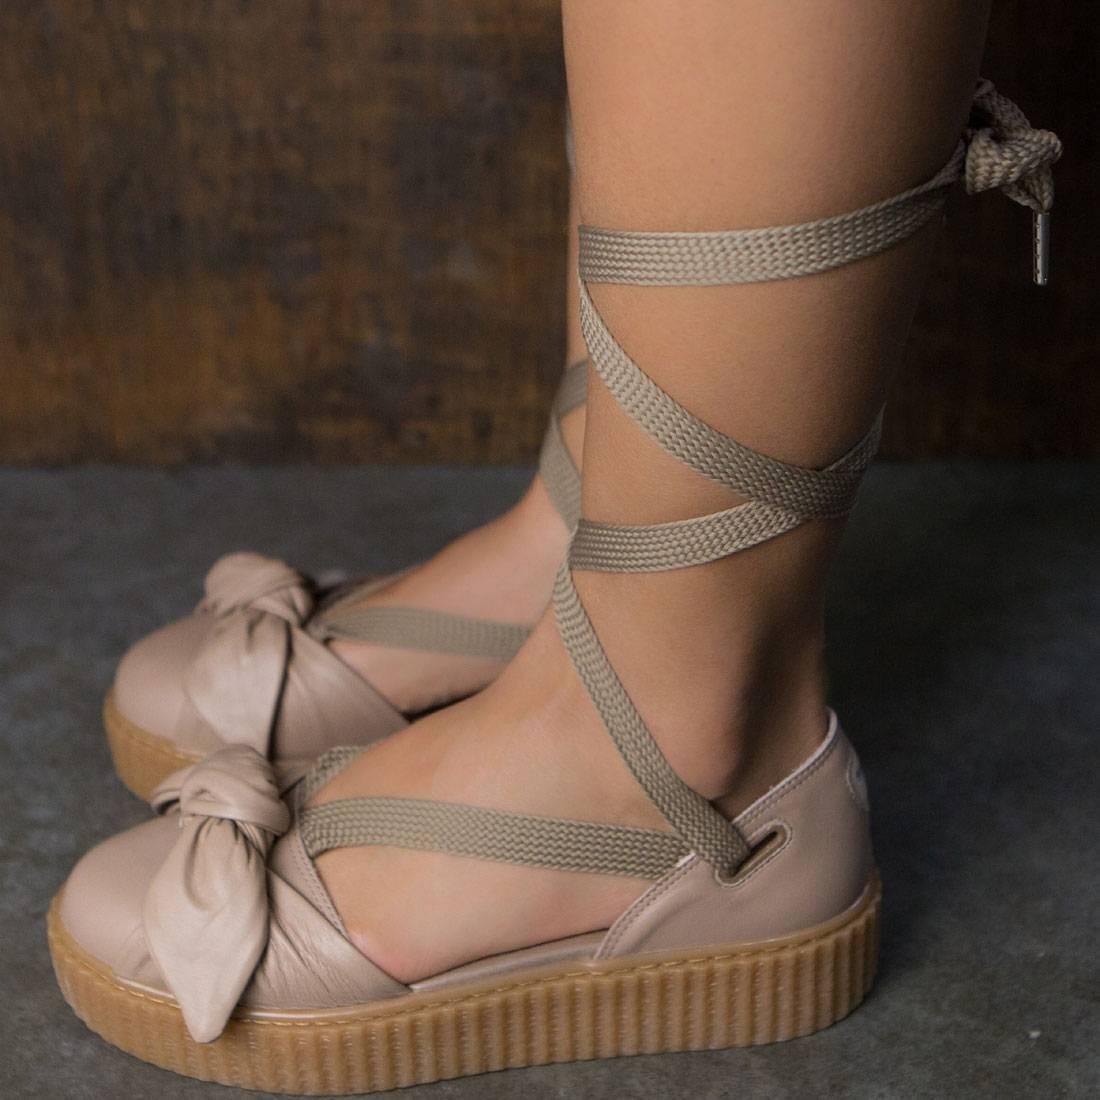 252d41121ddf07 Puma x Fenty By Rihanna Women Bow Creeper Sandal (natural   oatmeal)